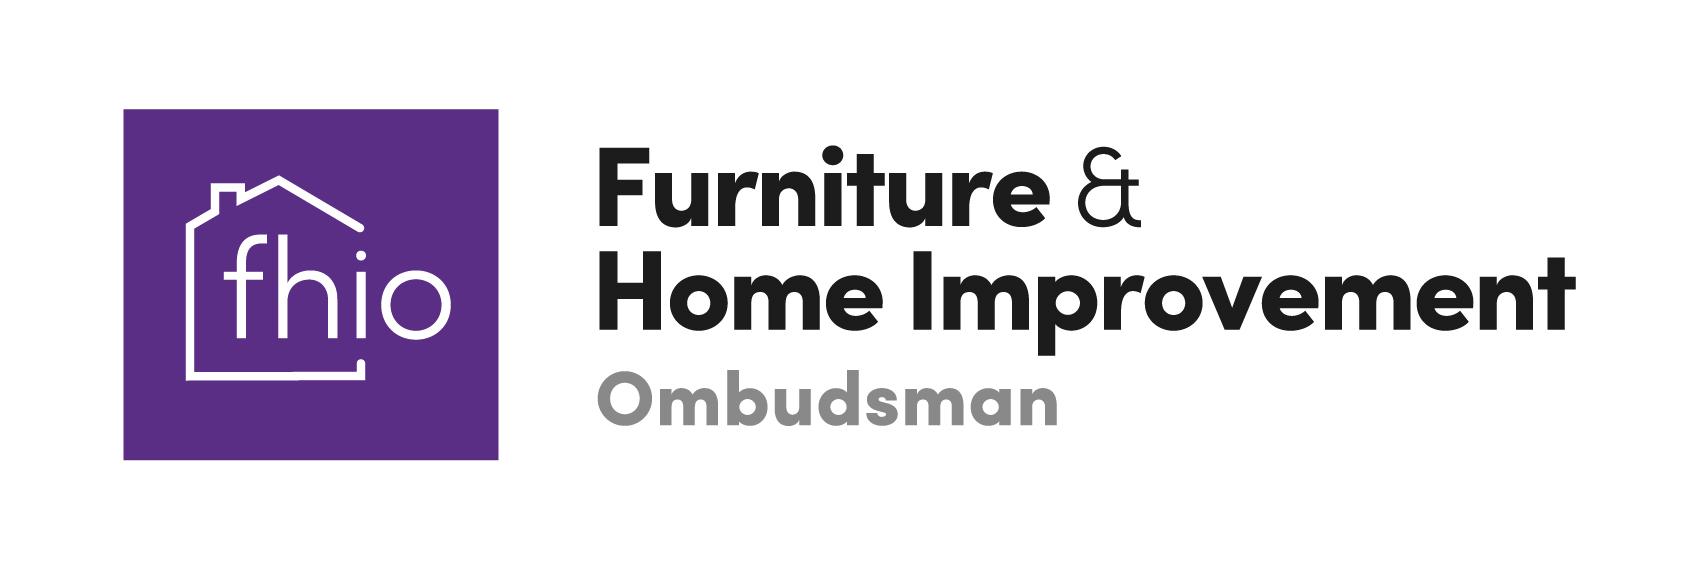 Furniture and Home Improvement Ombudsman (FHIO)